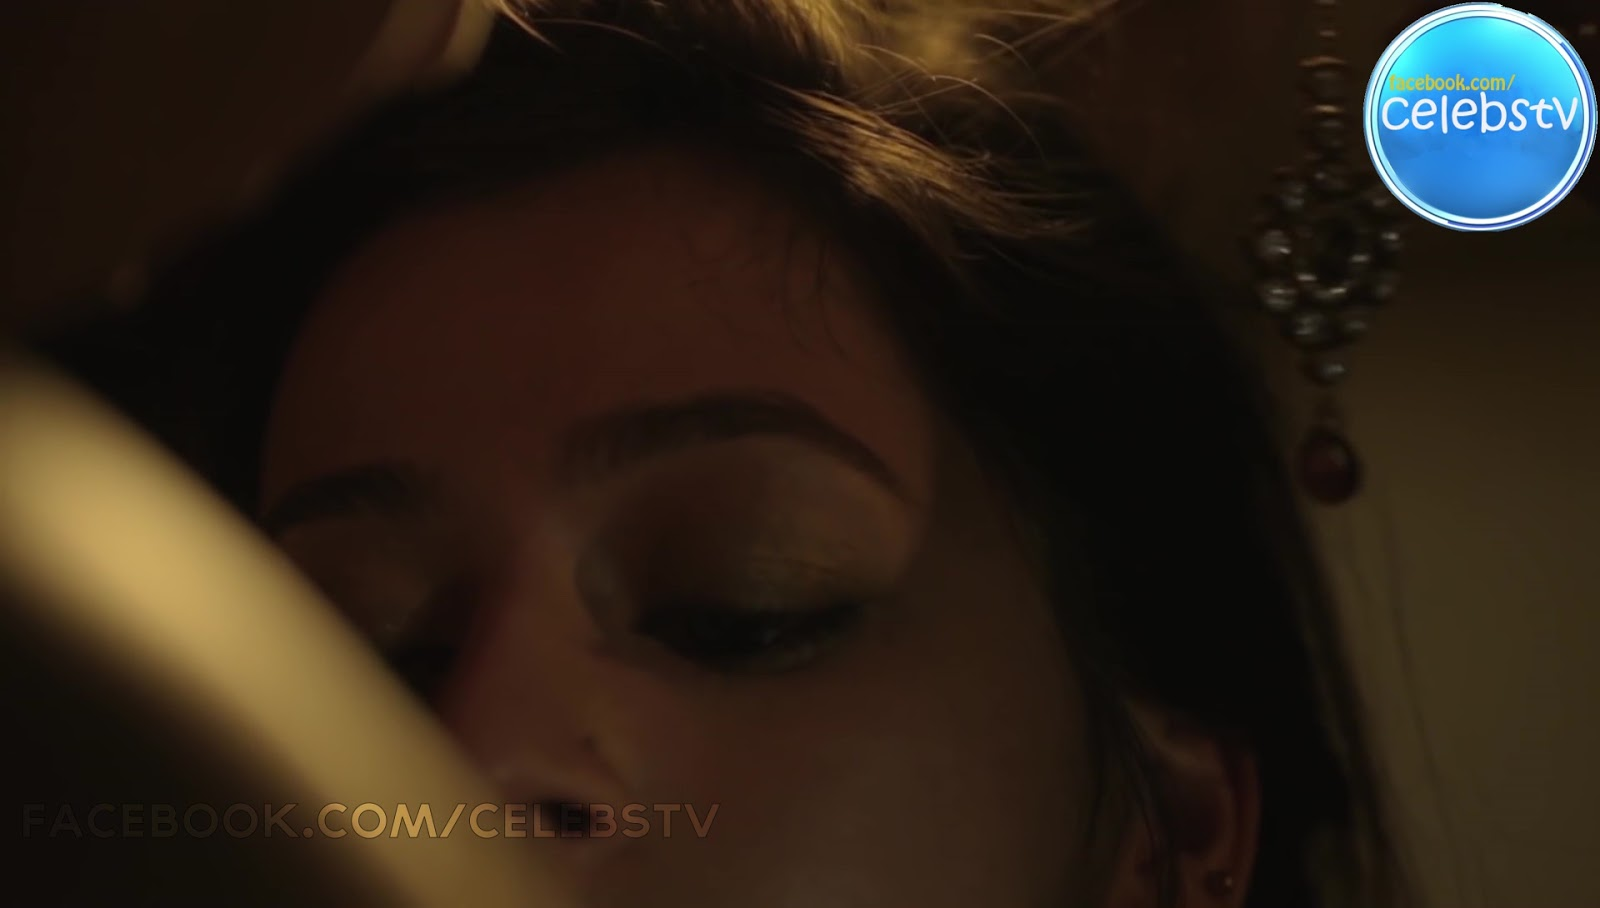 Priyal Gor Bare Navel Show And Smooch Scene - Sexy Celebs -2681